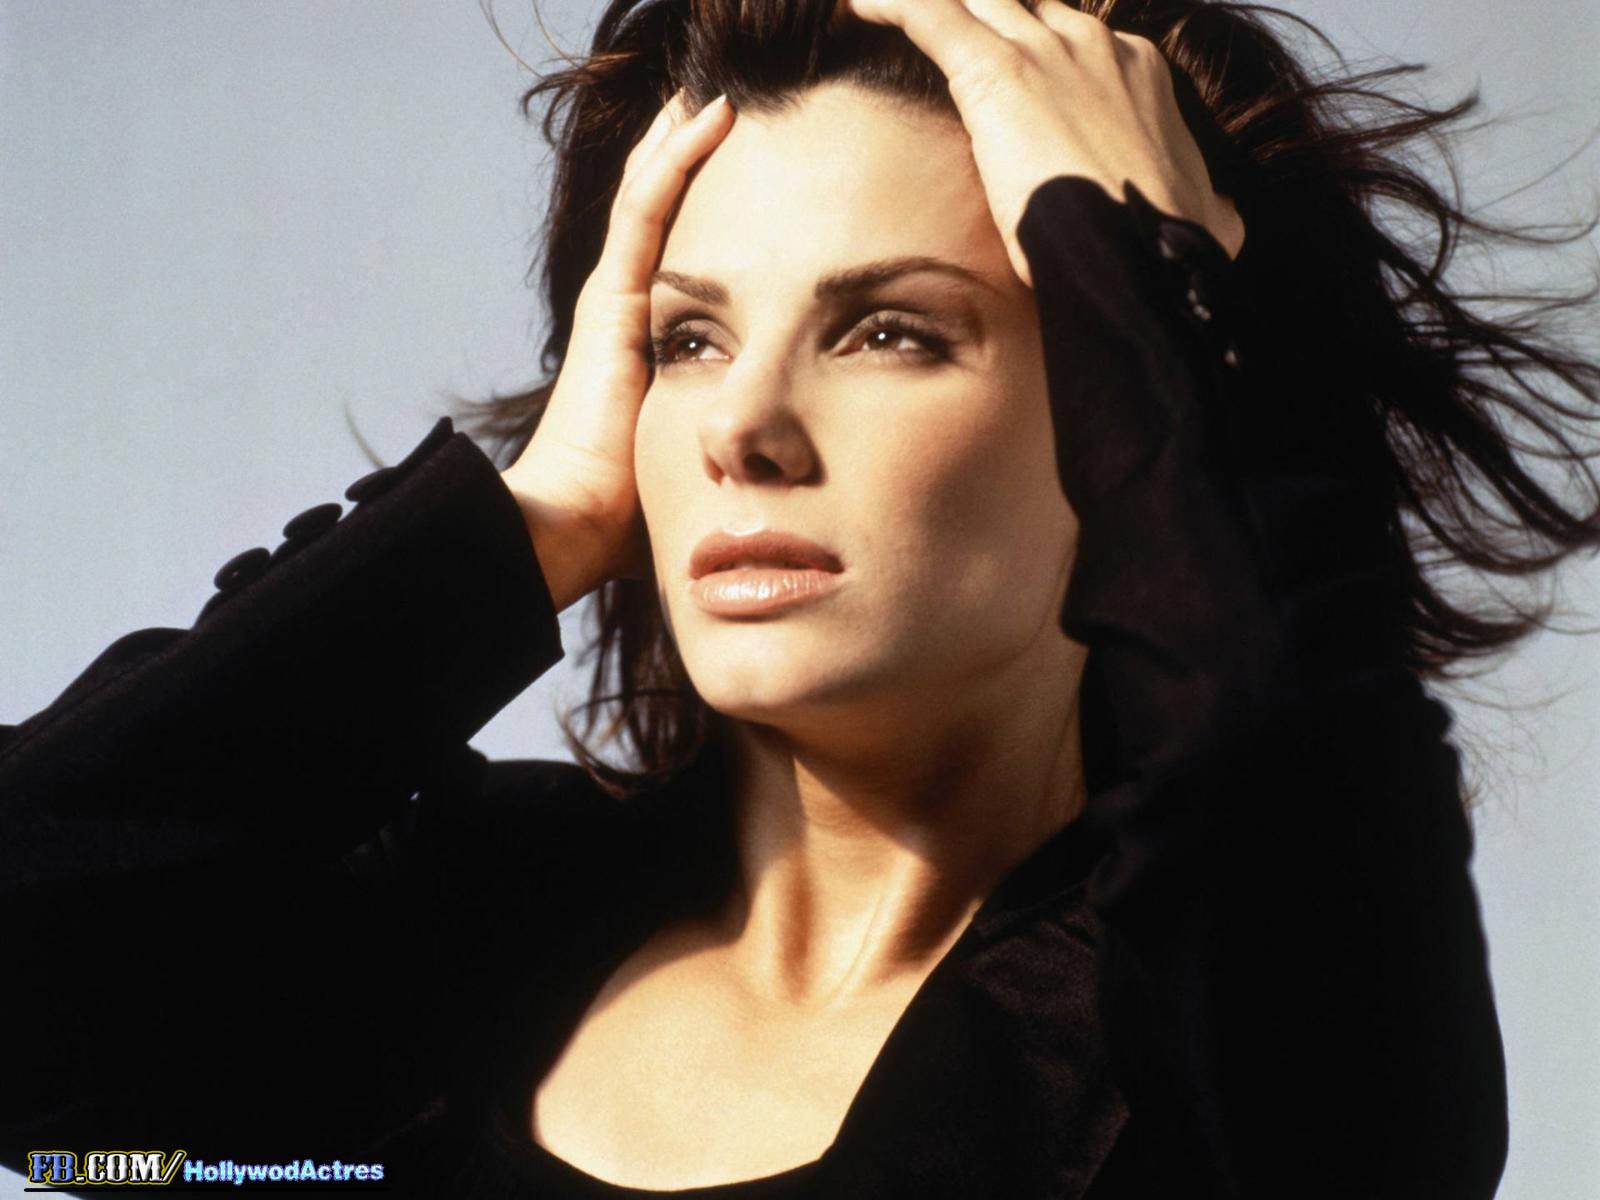 http://4.bp.blogspot.com/-vYDHetGQS_A/URSVatb_SUI/AAAAAAAALhU/yodxnY1Ahck/s1600/Sandra+Bullock+14.jpg